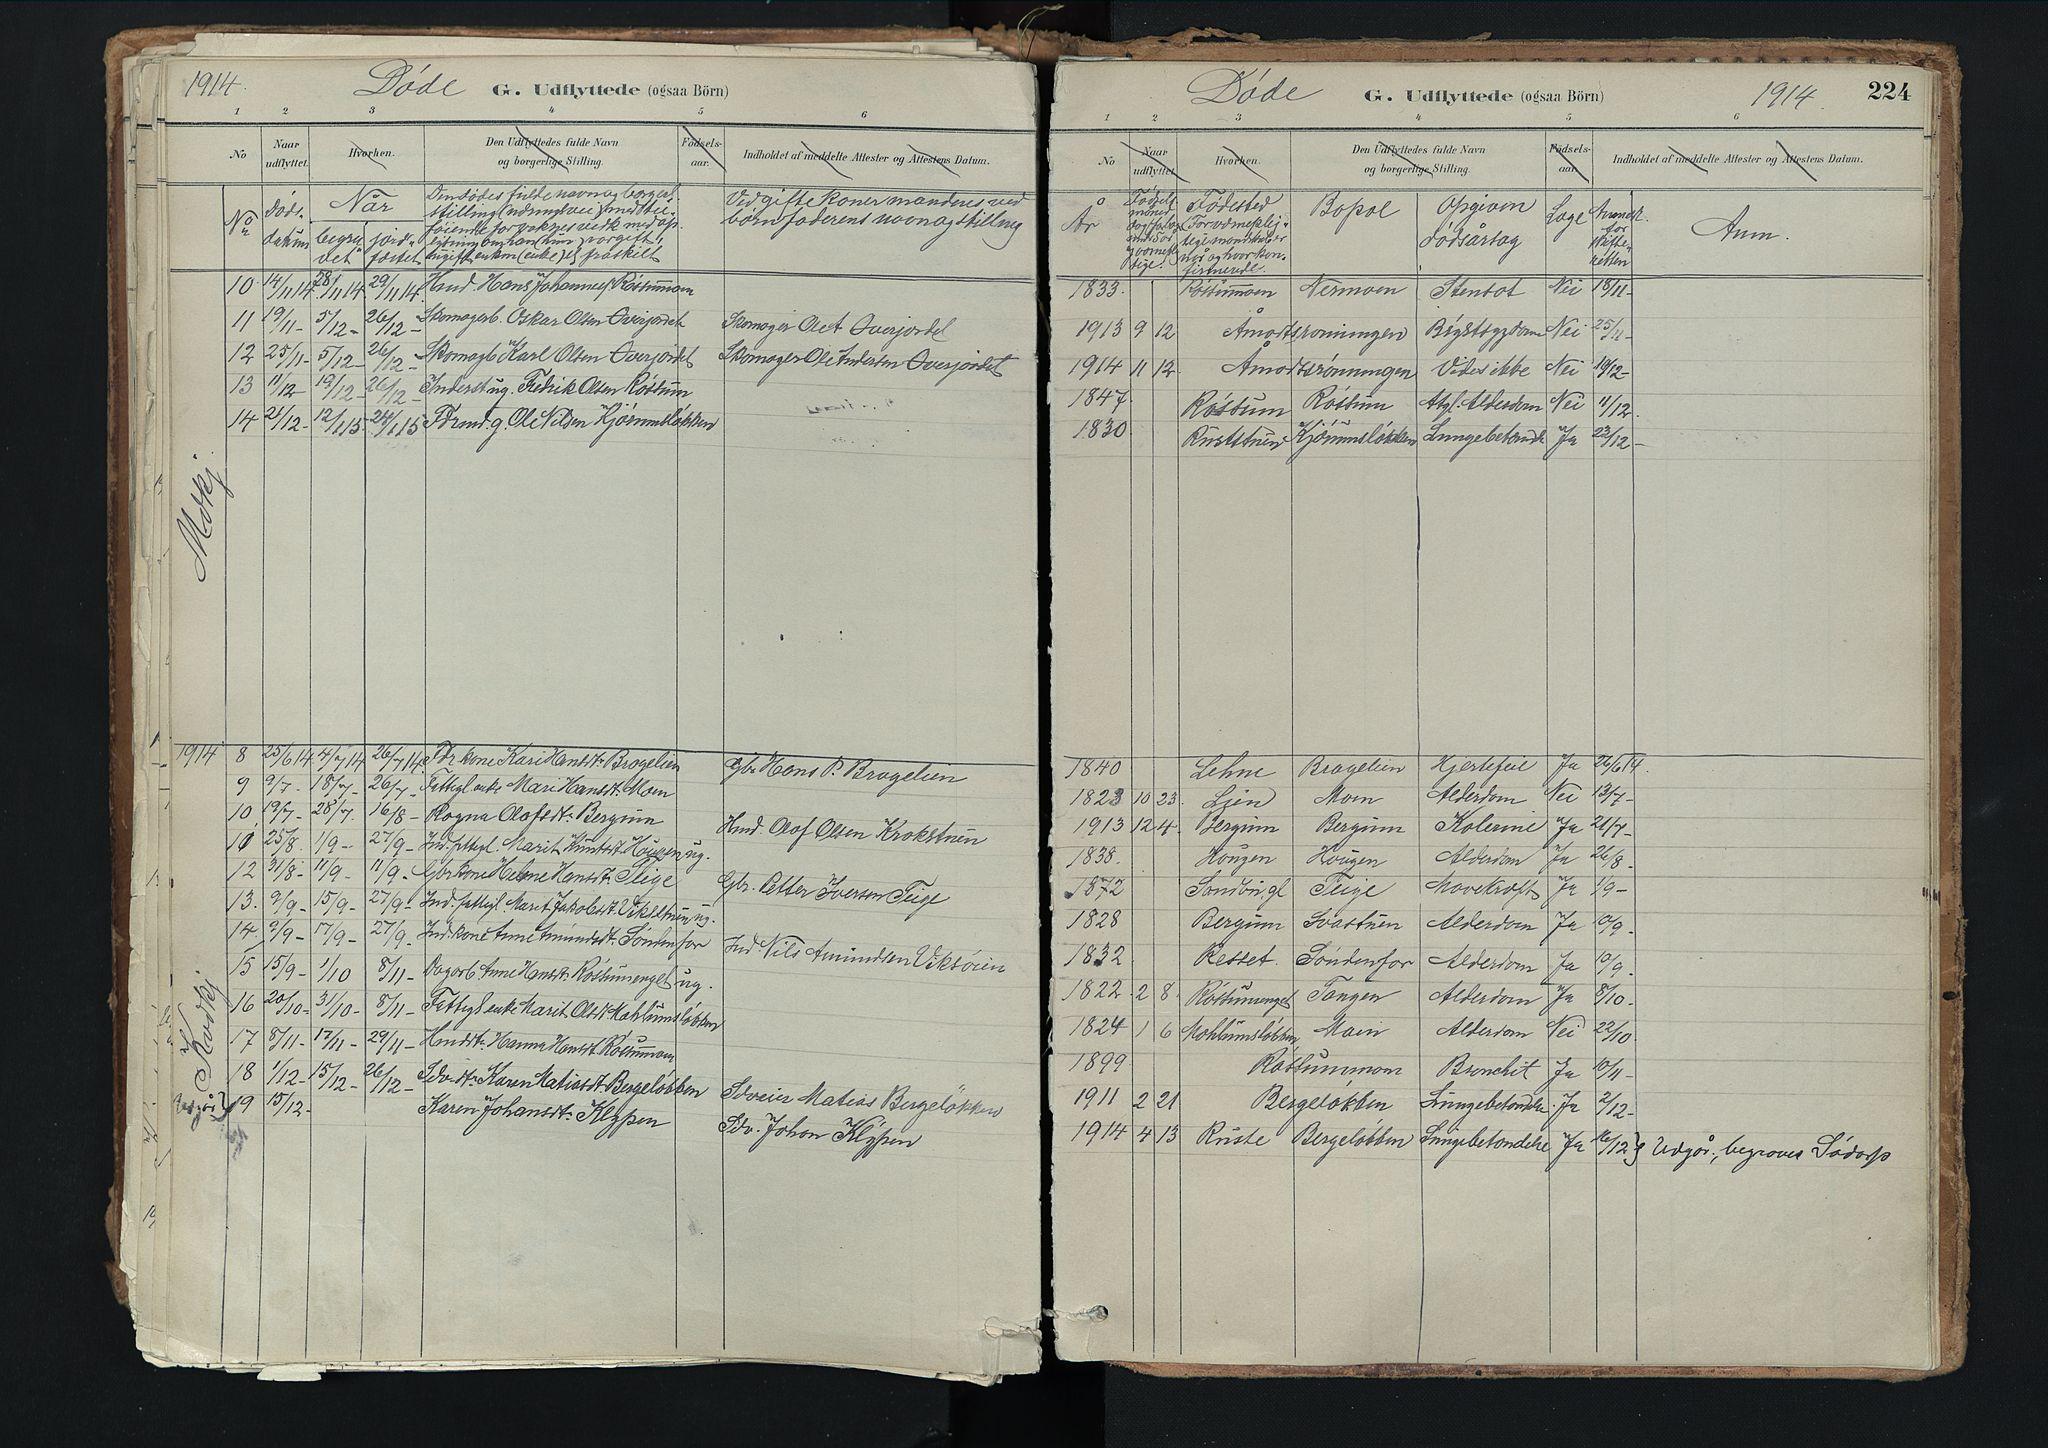 SAH, Nord-Fron prestekontor, Ministerialbok nr. 3, 1884-1914, s. 224